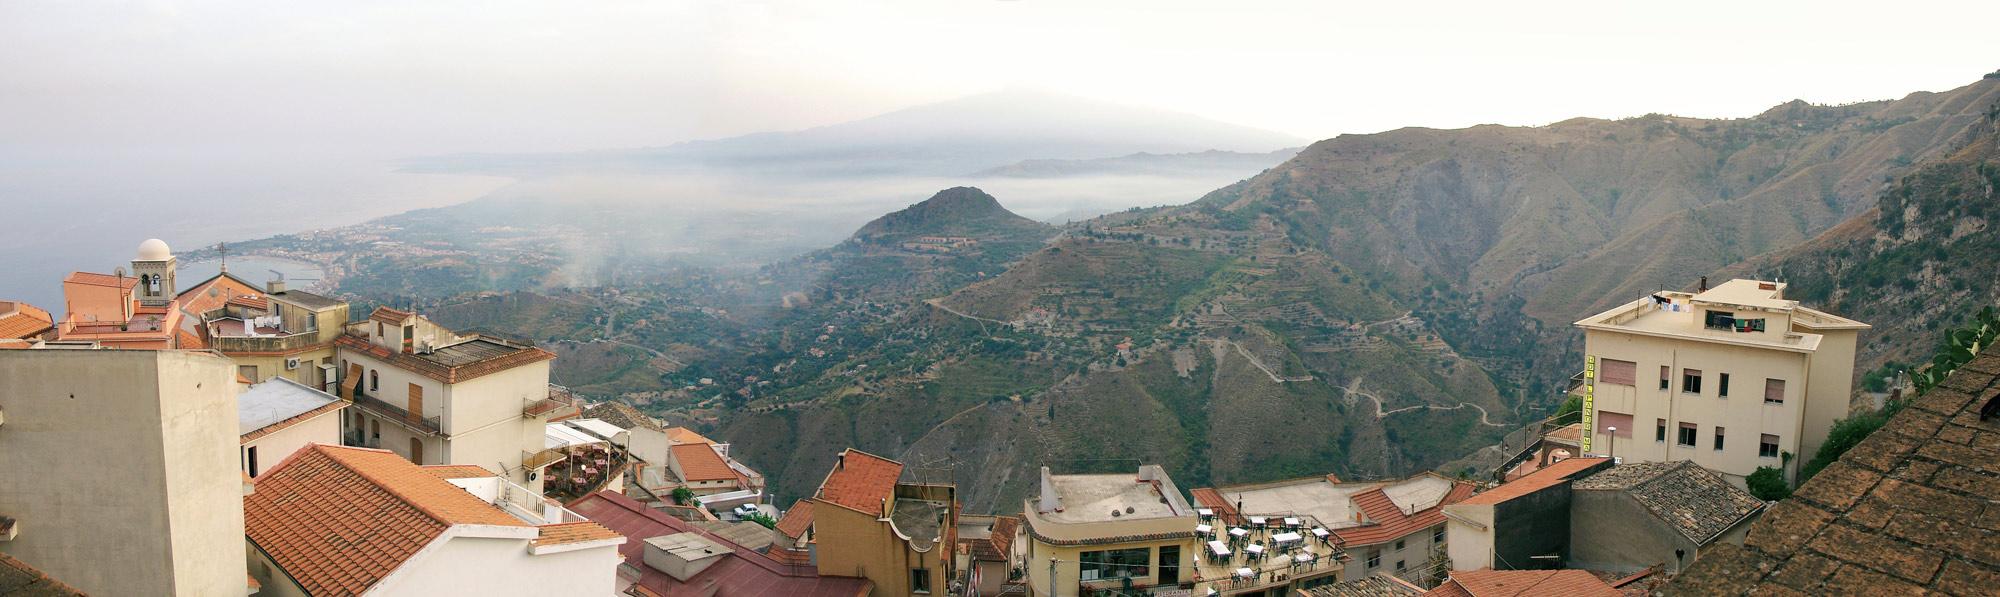 Castelmola Sizilien